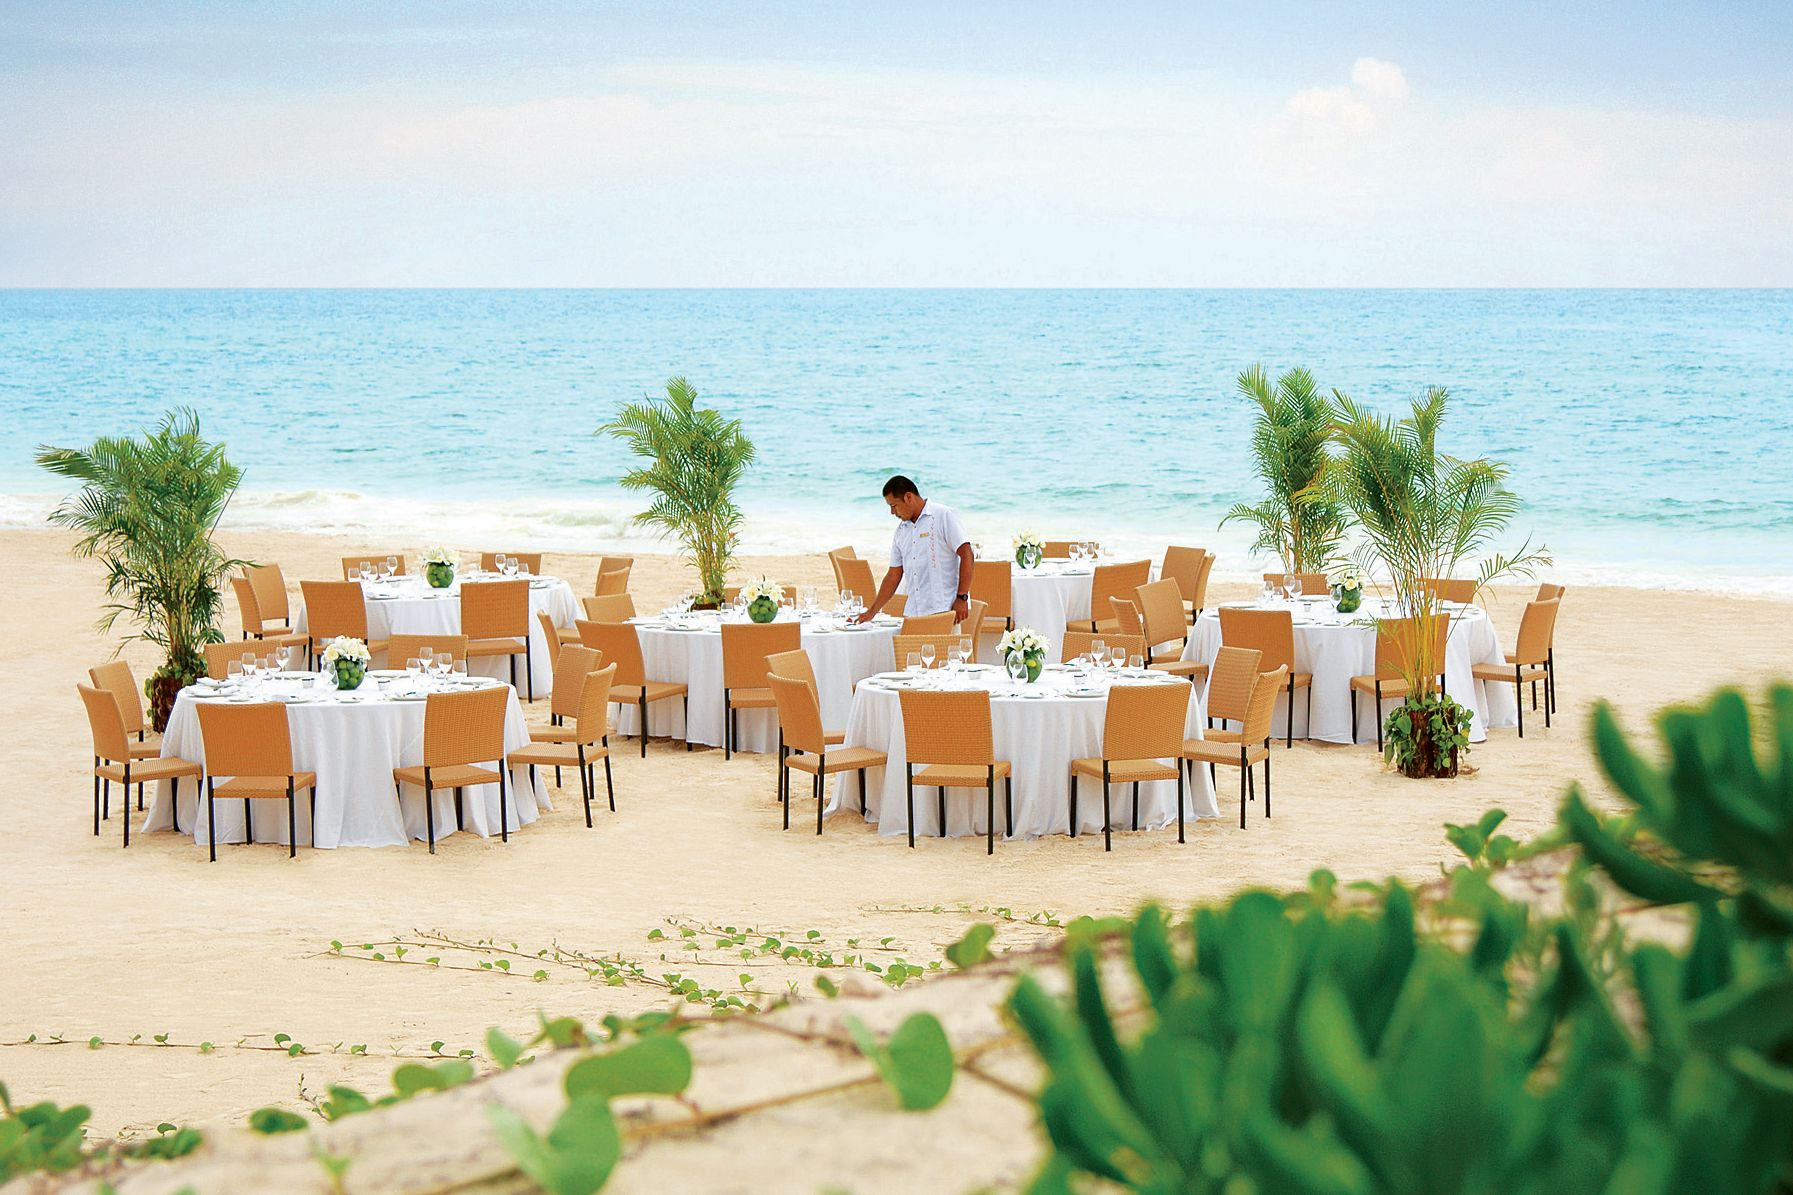 Beach wedding decoration ideas  Real Brides Spill Their Biggest Budget Mistakes  My wedding